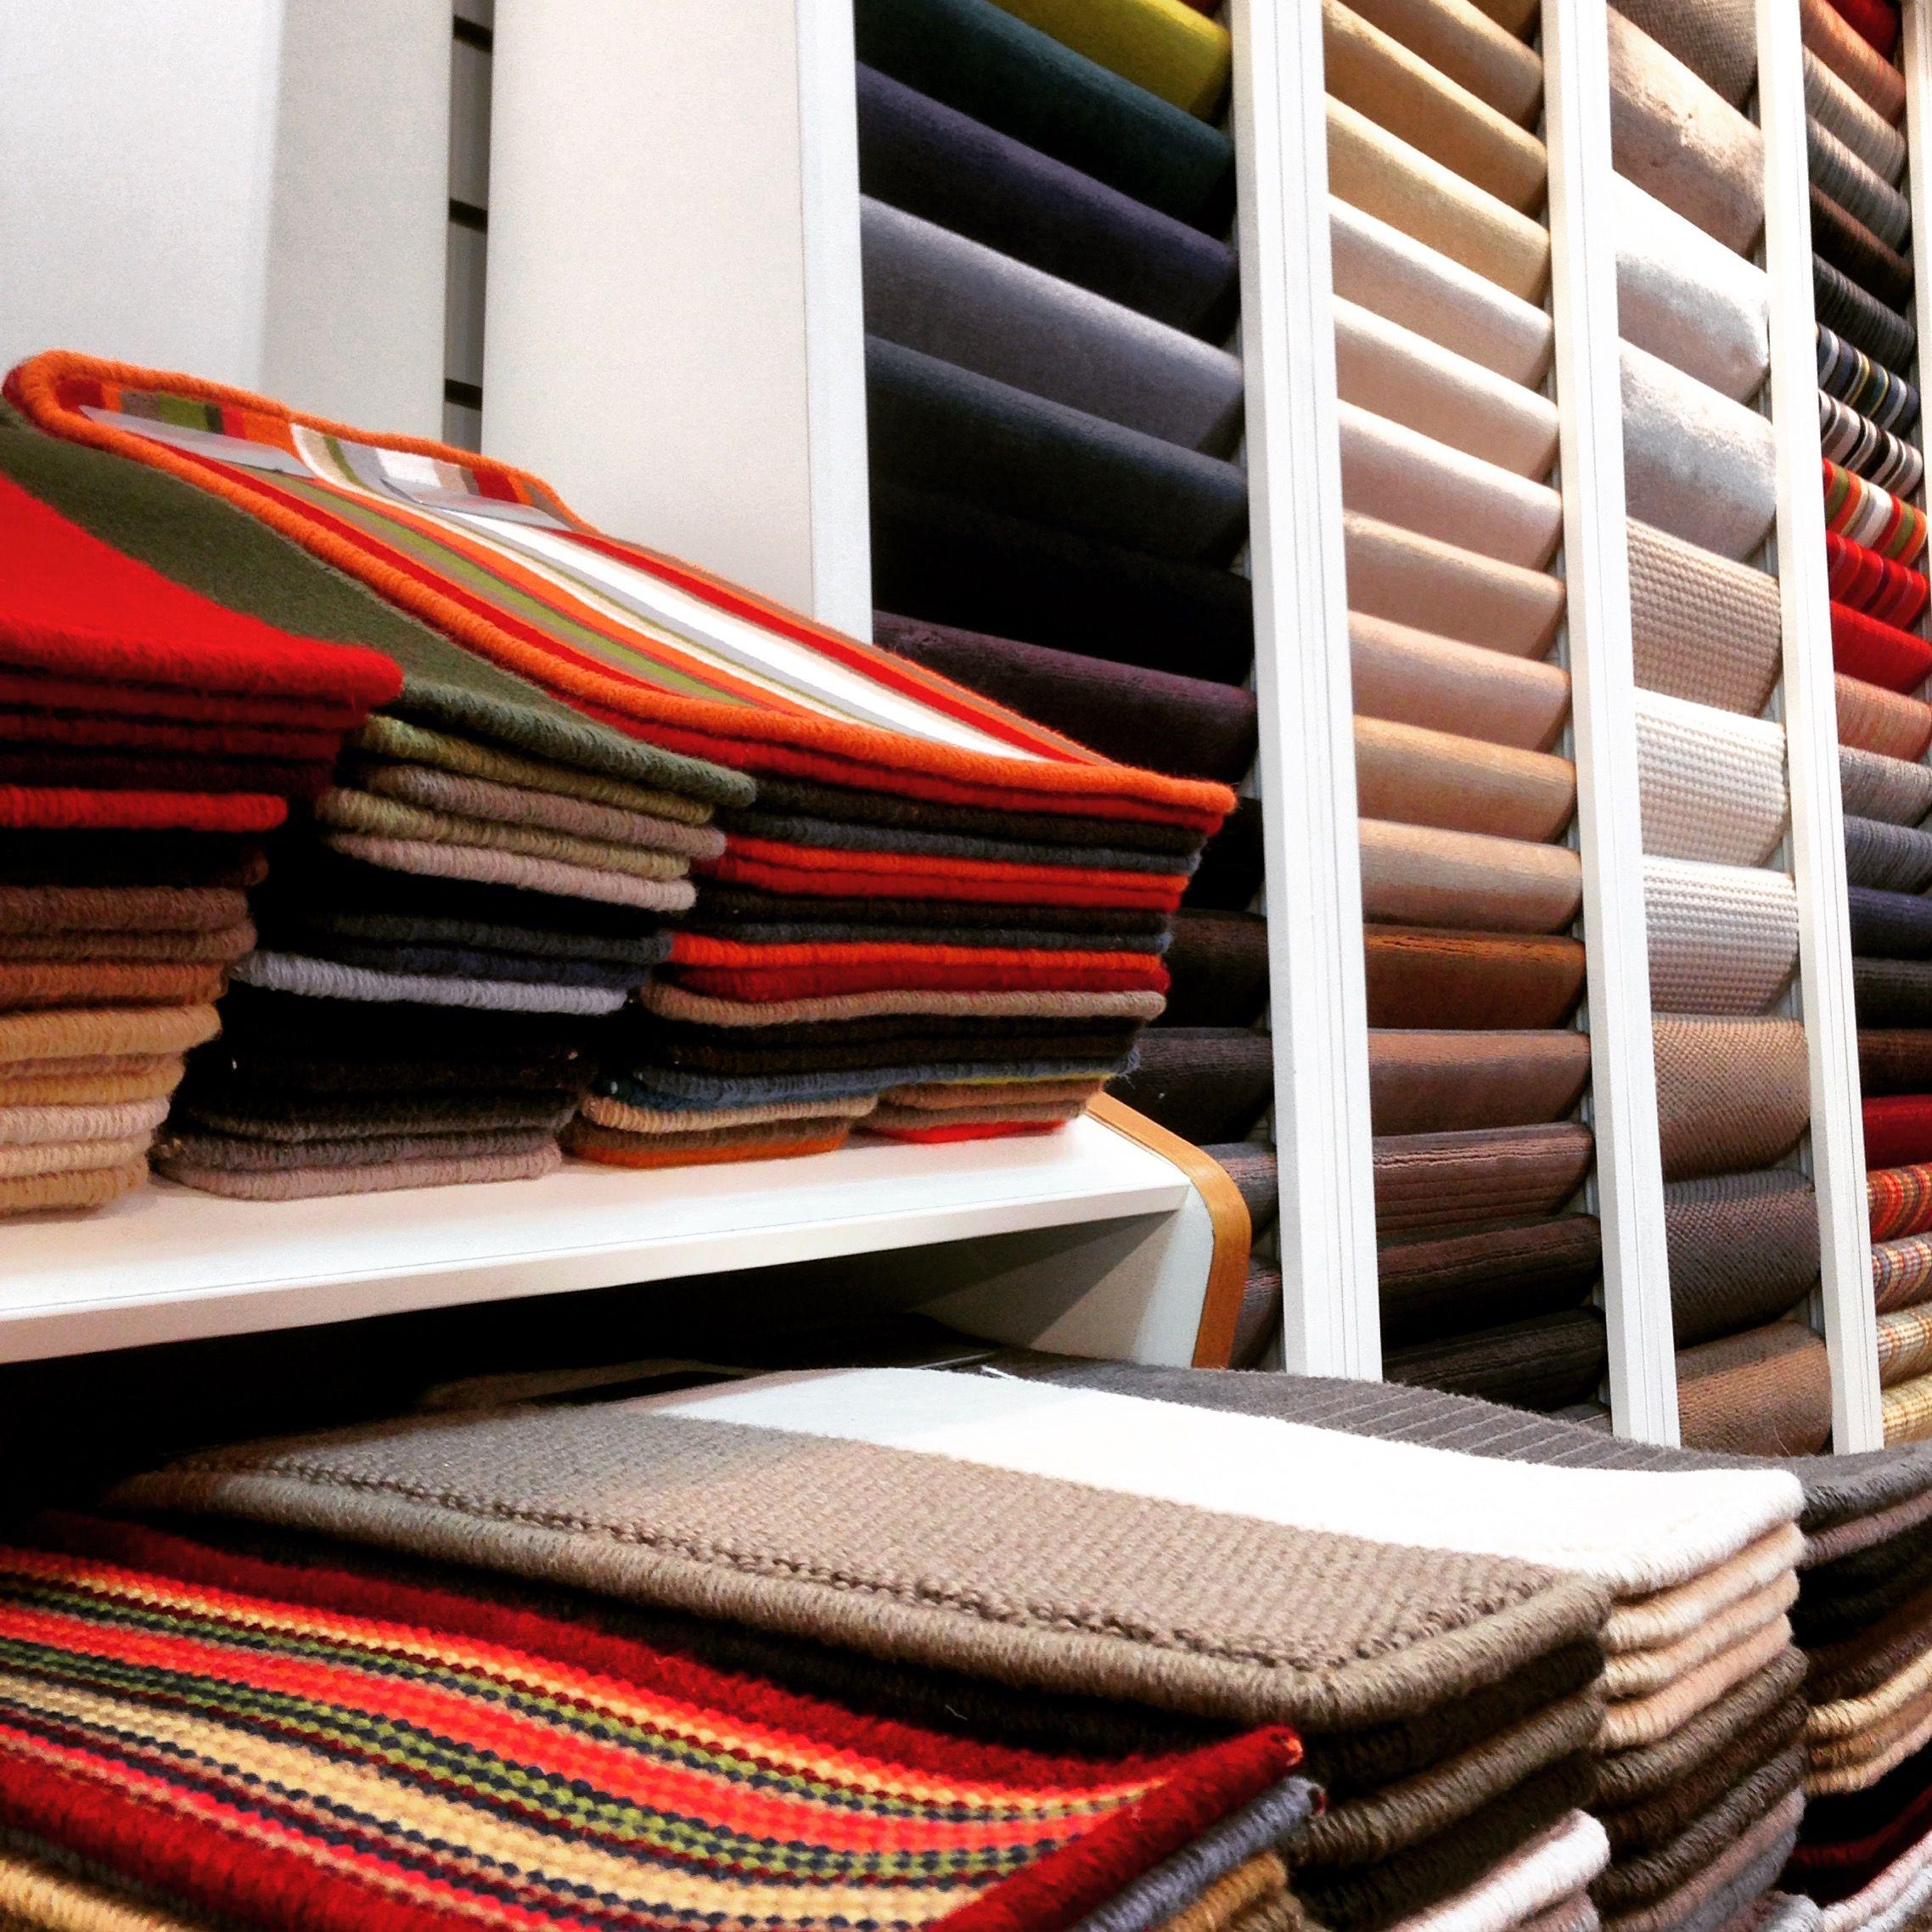 Carpet Sample Lectern Display Inc Sliding Draw Wall Units For Louis De Poortere Display Furniture Showroom Design Fabric Display